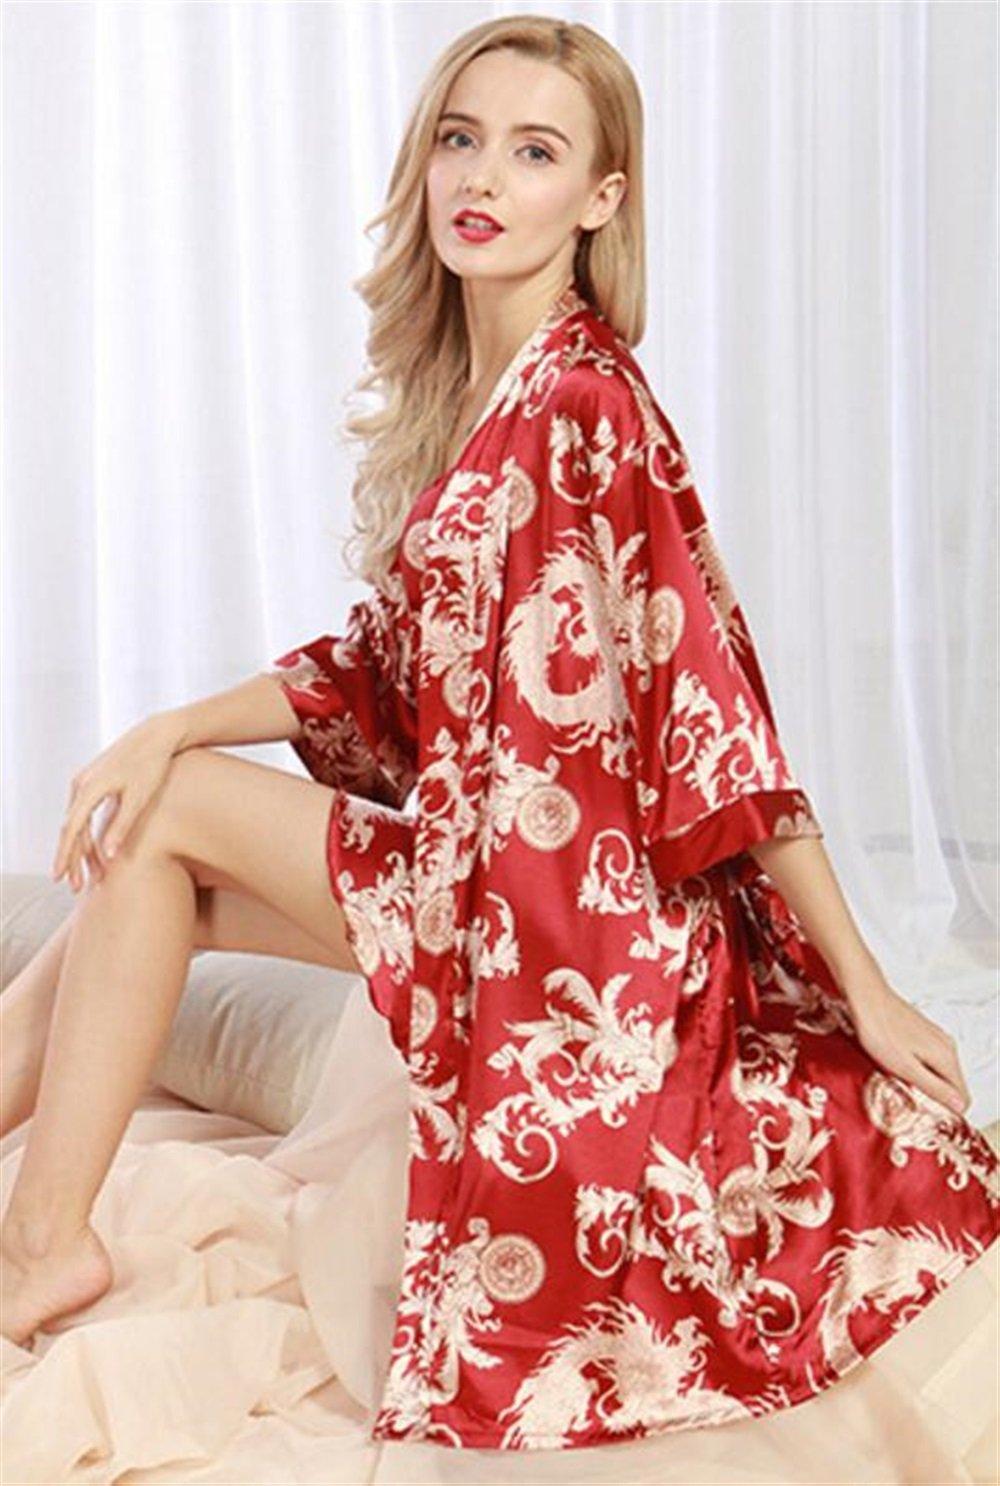 BOBOJW - Albornoz de Manga Media para Mujer, diseño de dragón, Rojo Vino, Large: Amazon.es: Hogar